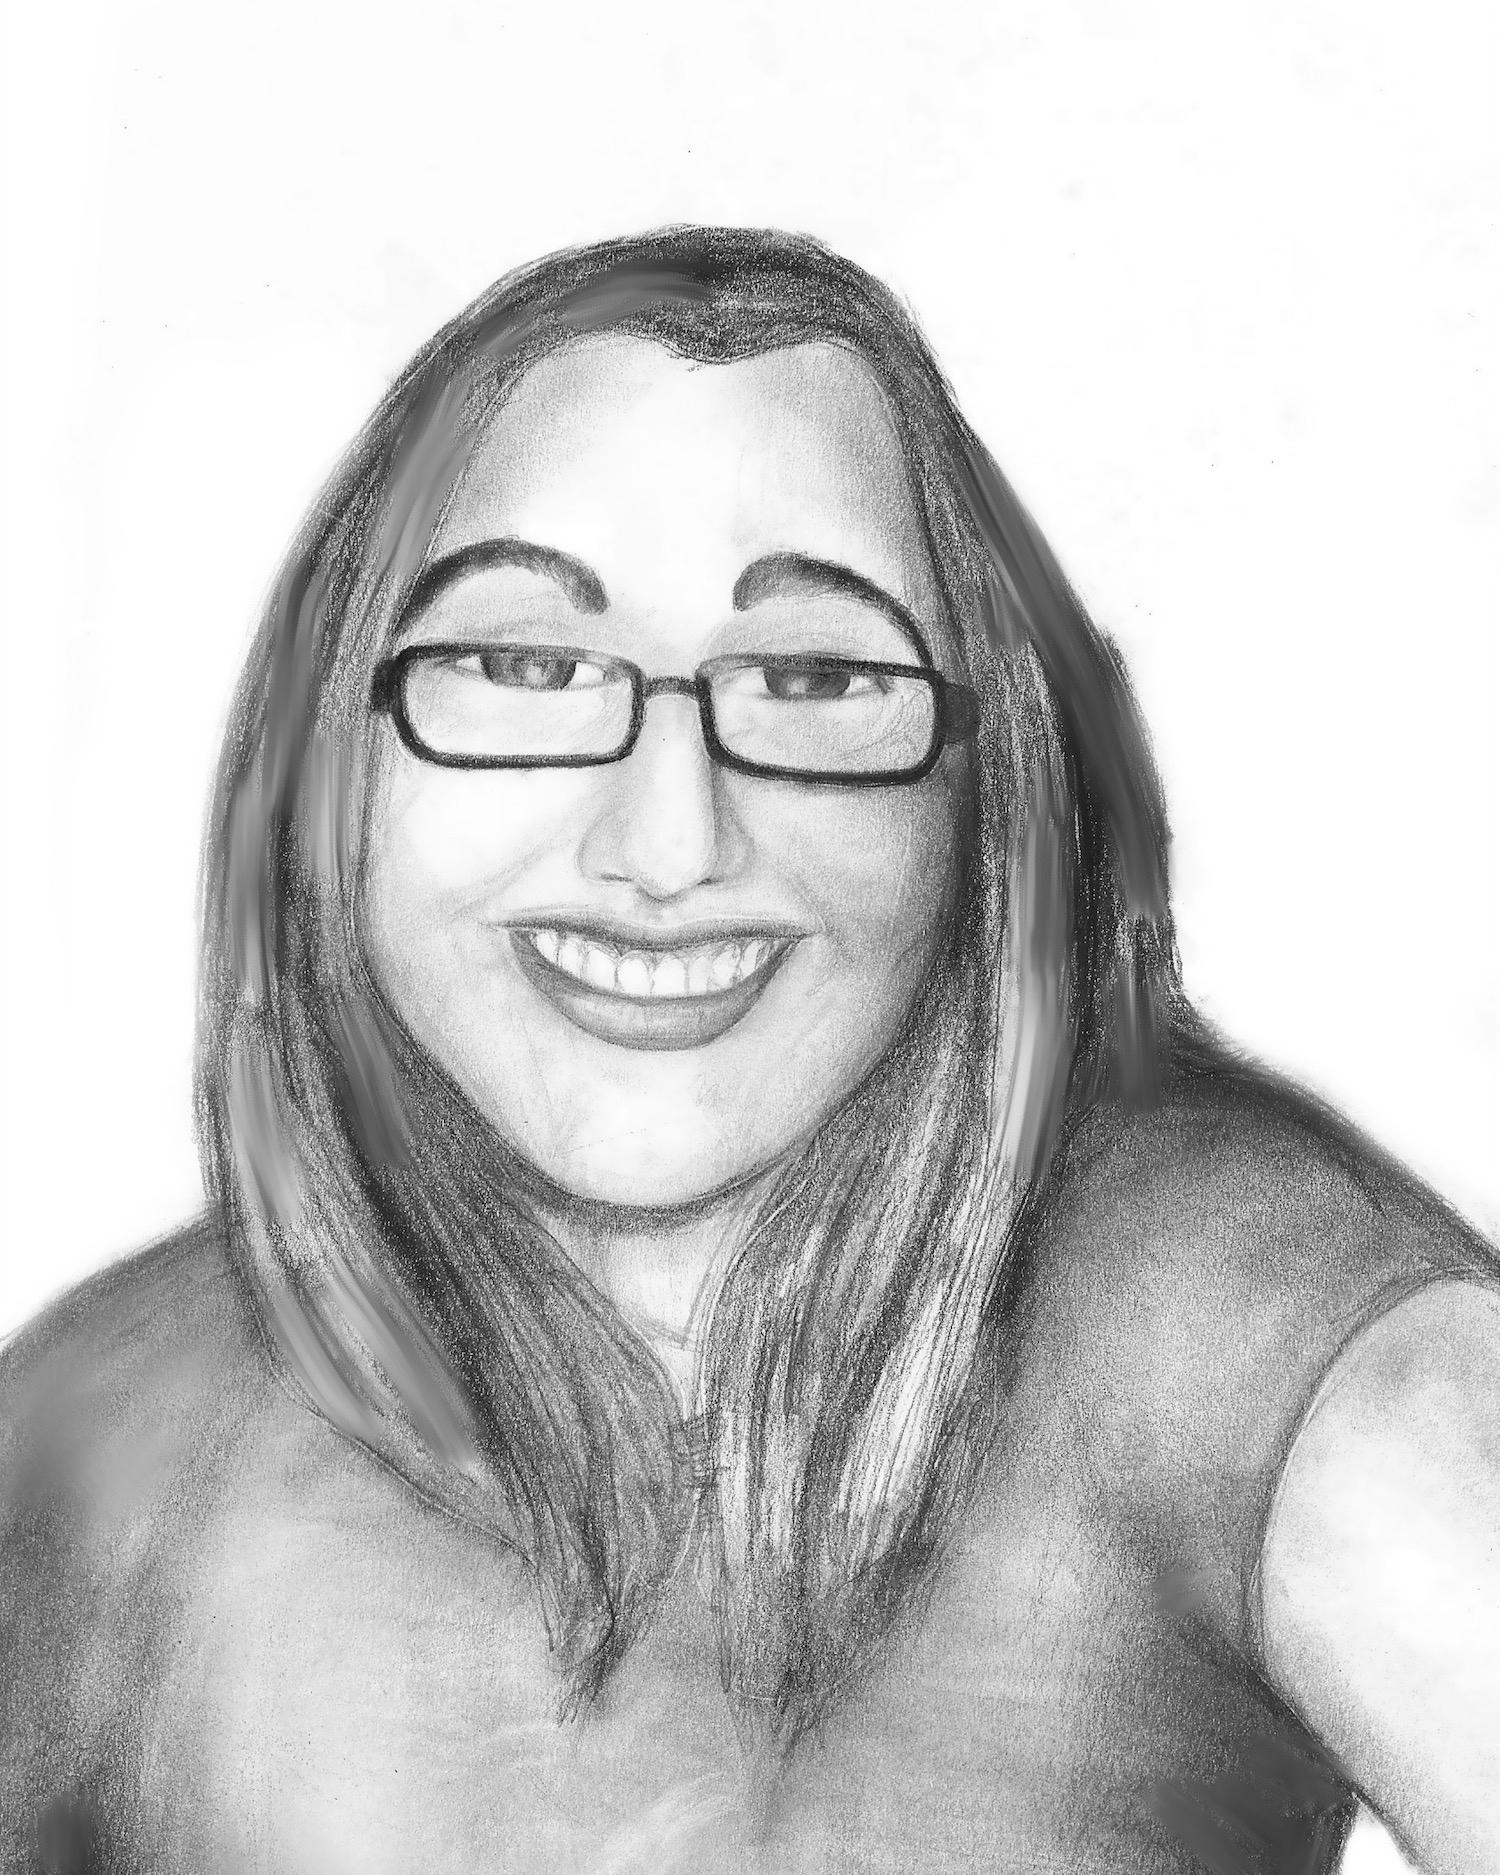 Angela Decristofano